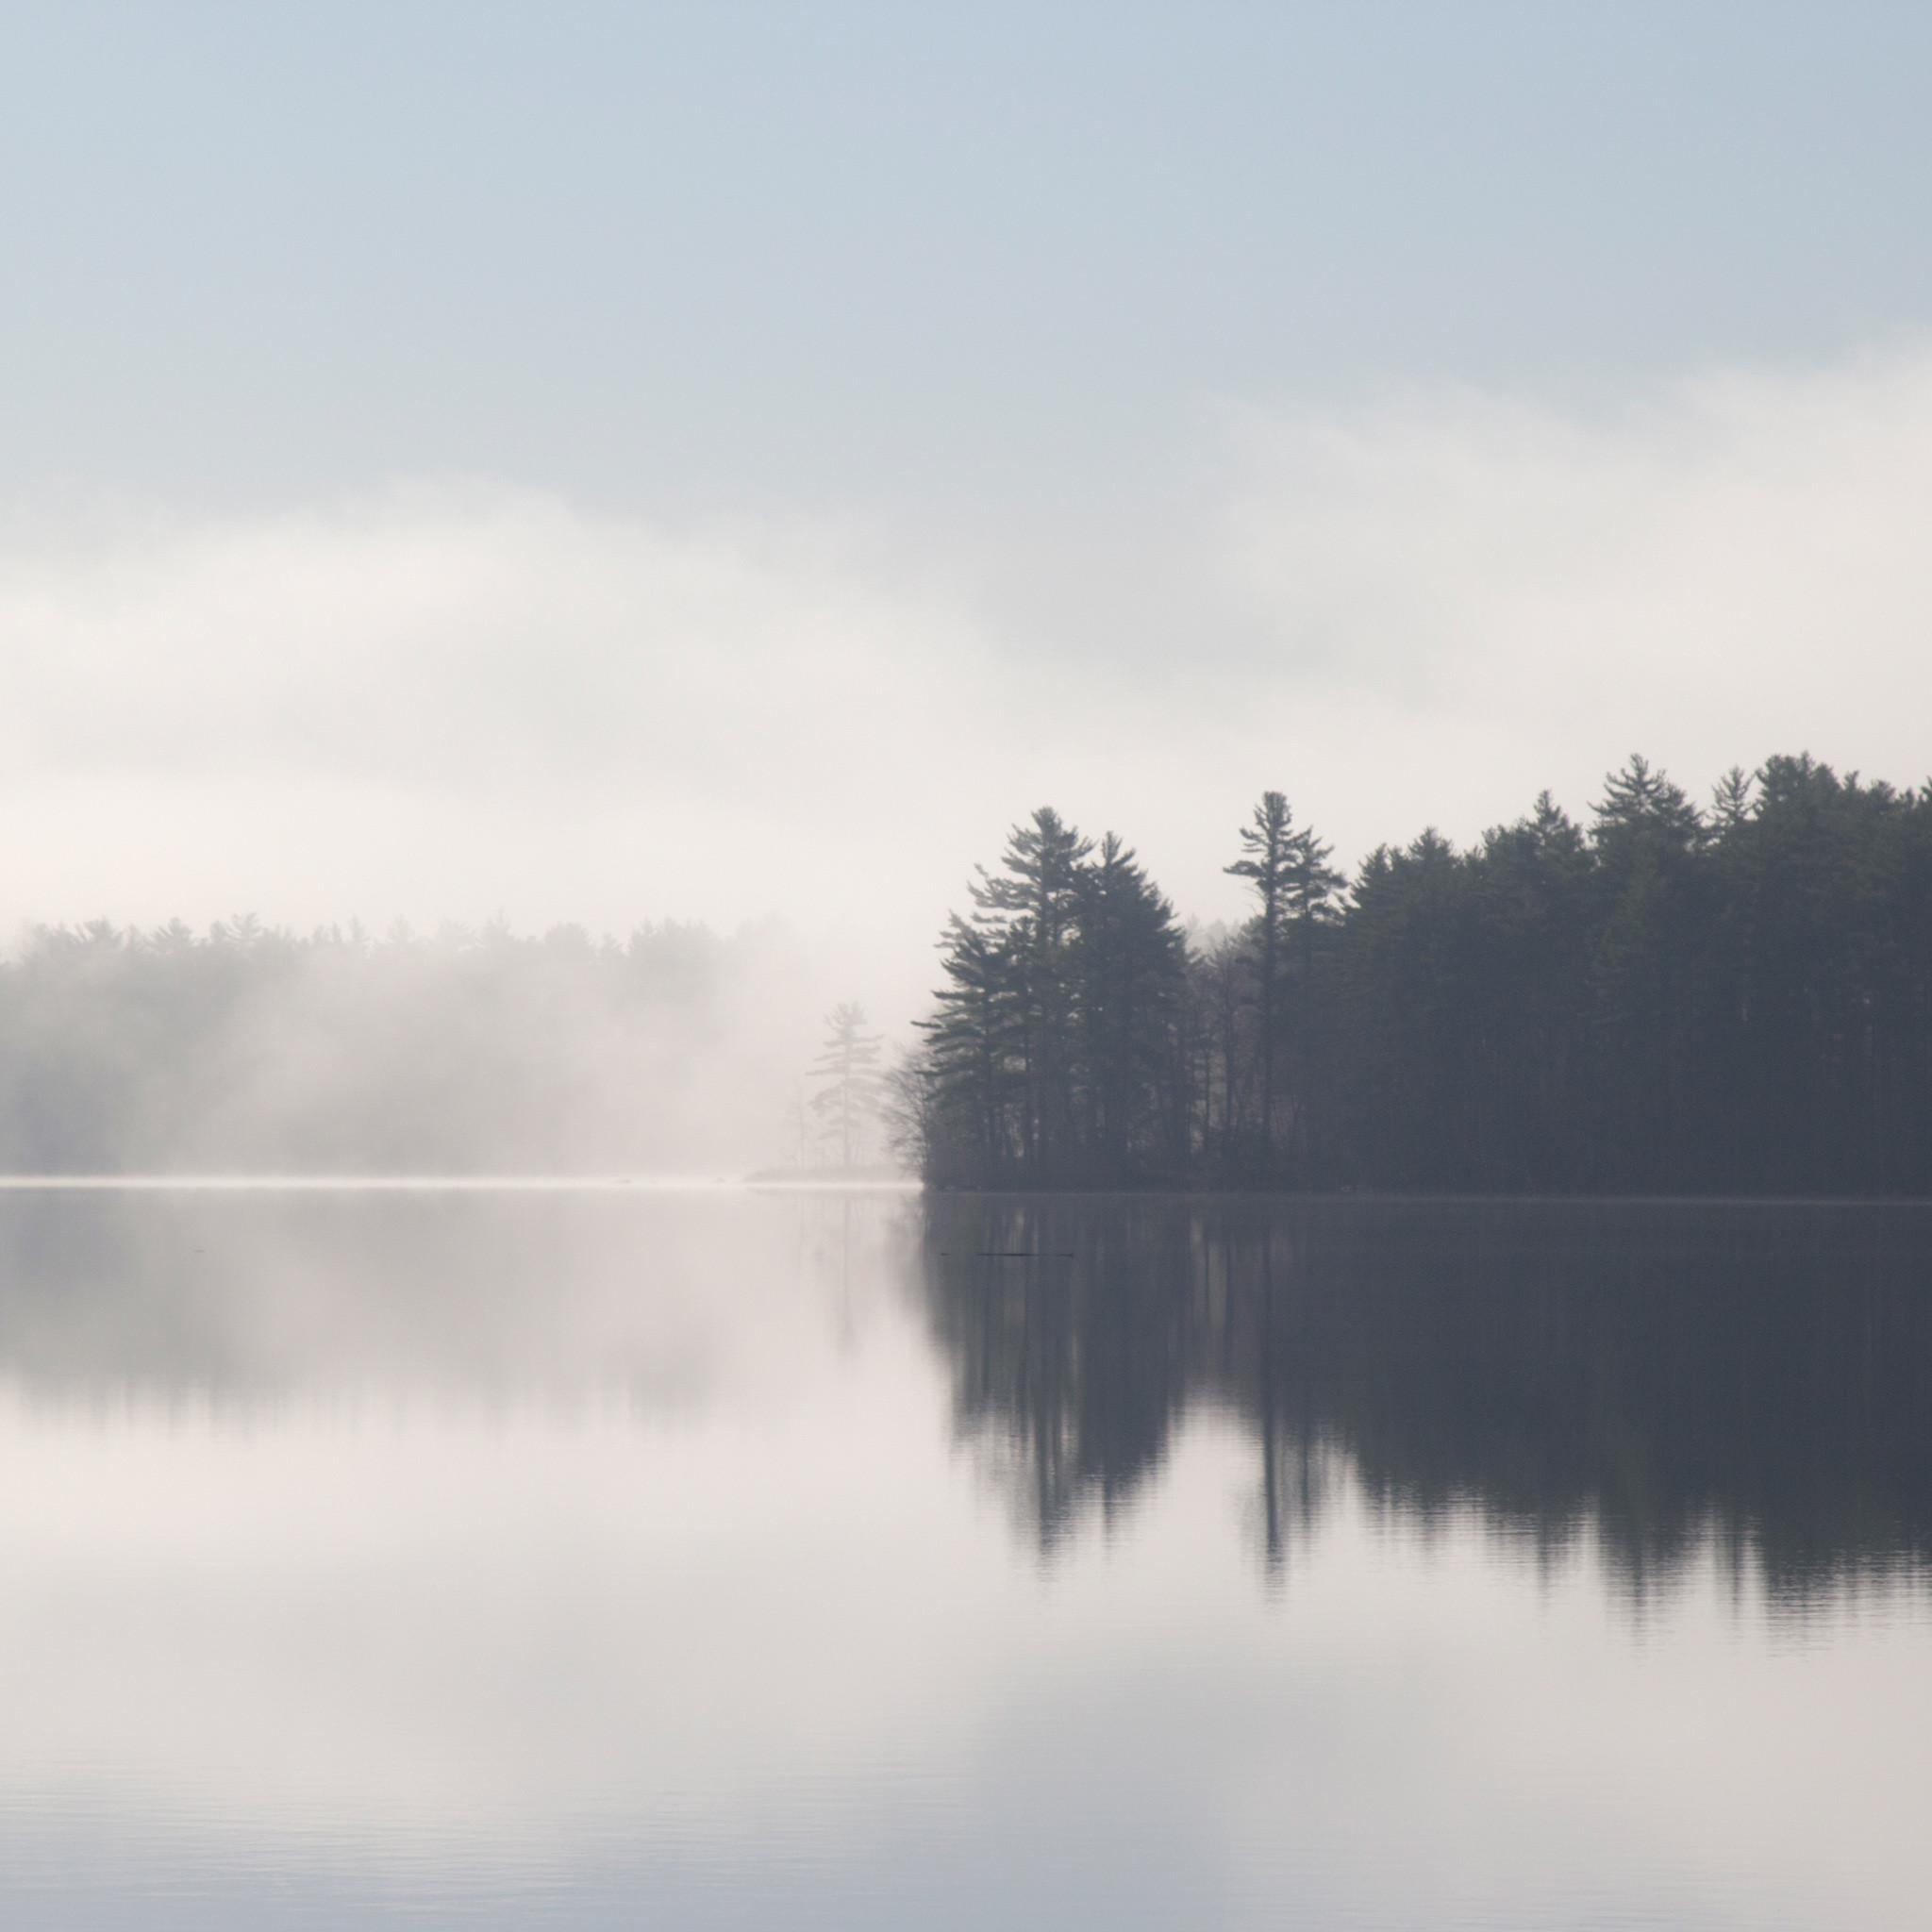 … calming lake landscape ipad wallpaper …